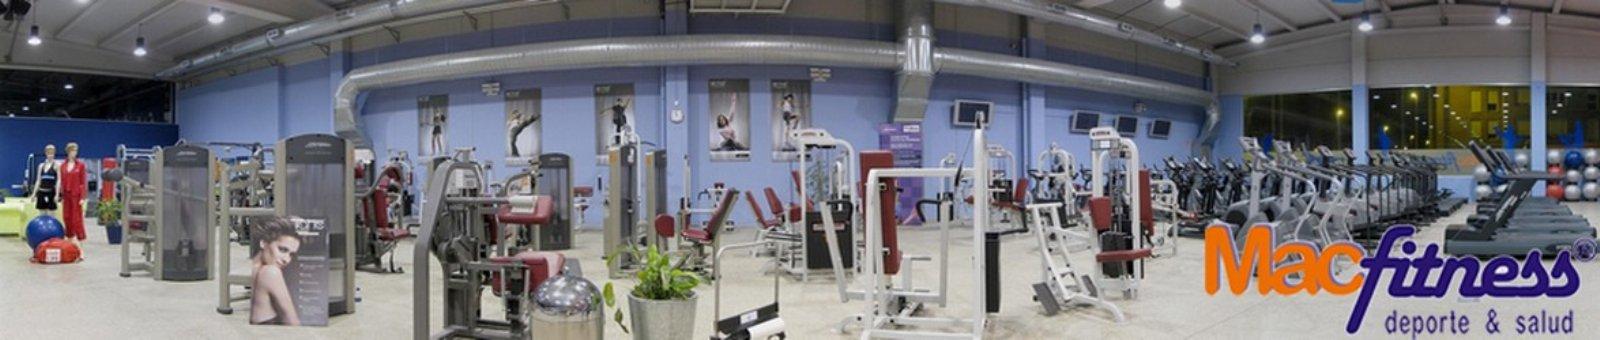 MacFitness, fitness, pista 360ball, 360ball en palencia, 360ball